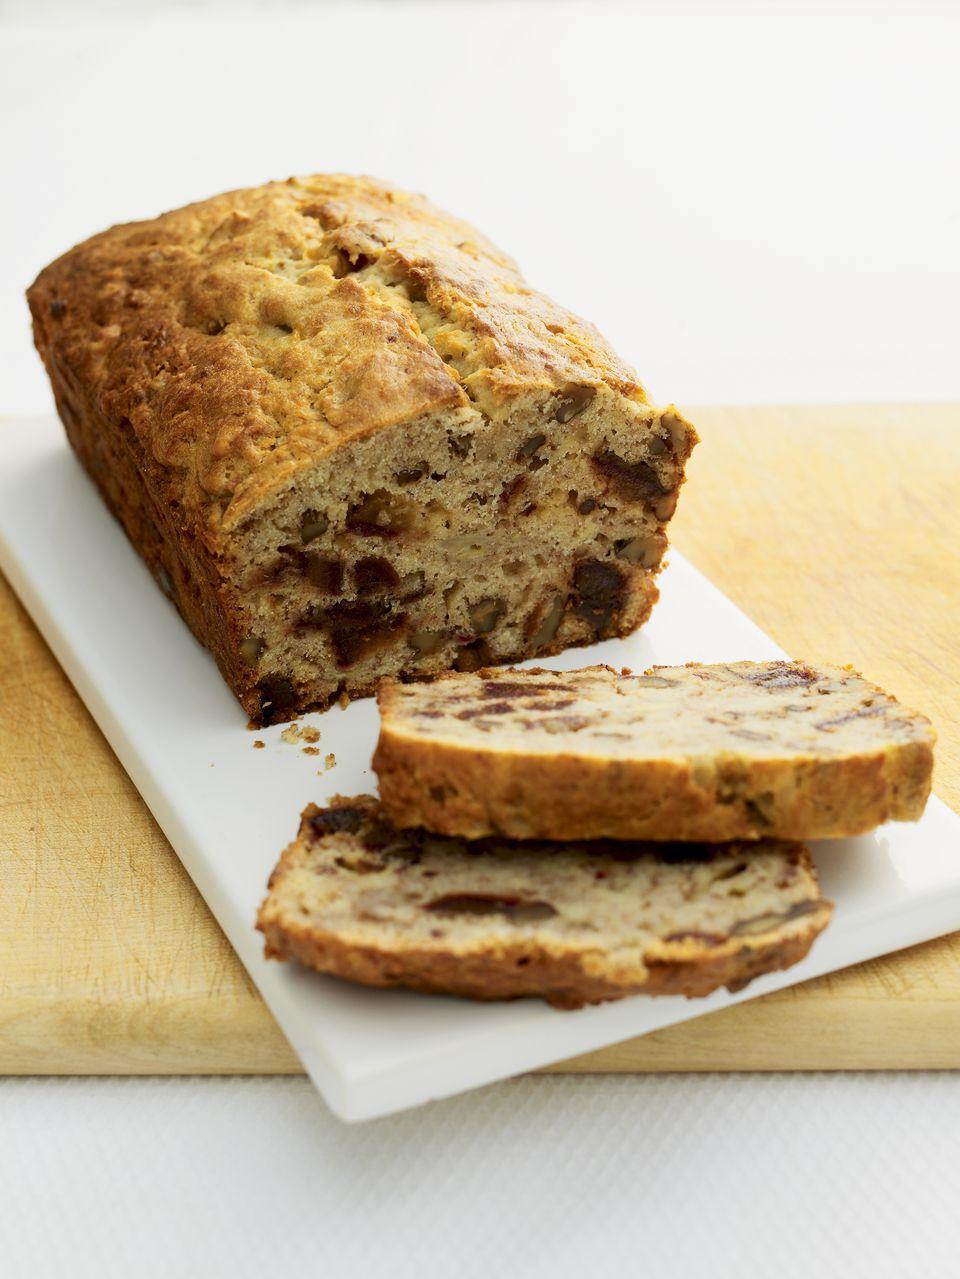 Banana, date, and walnut loaf